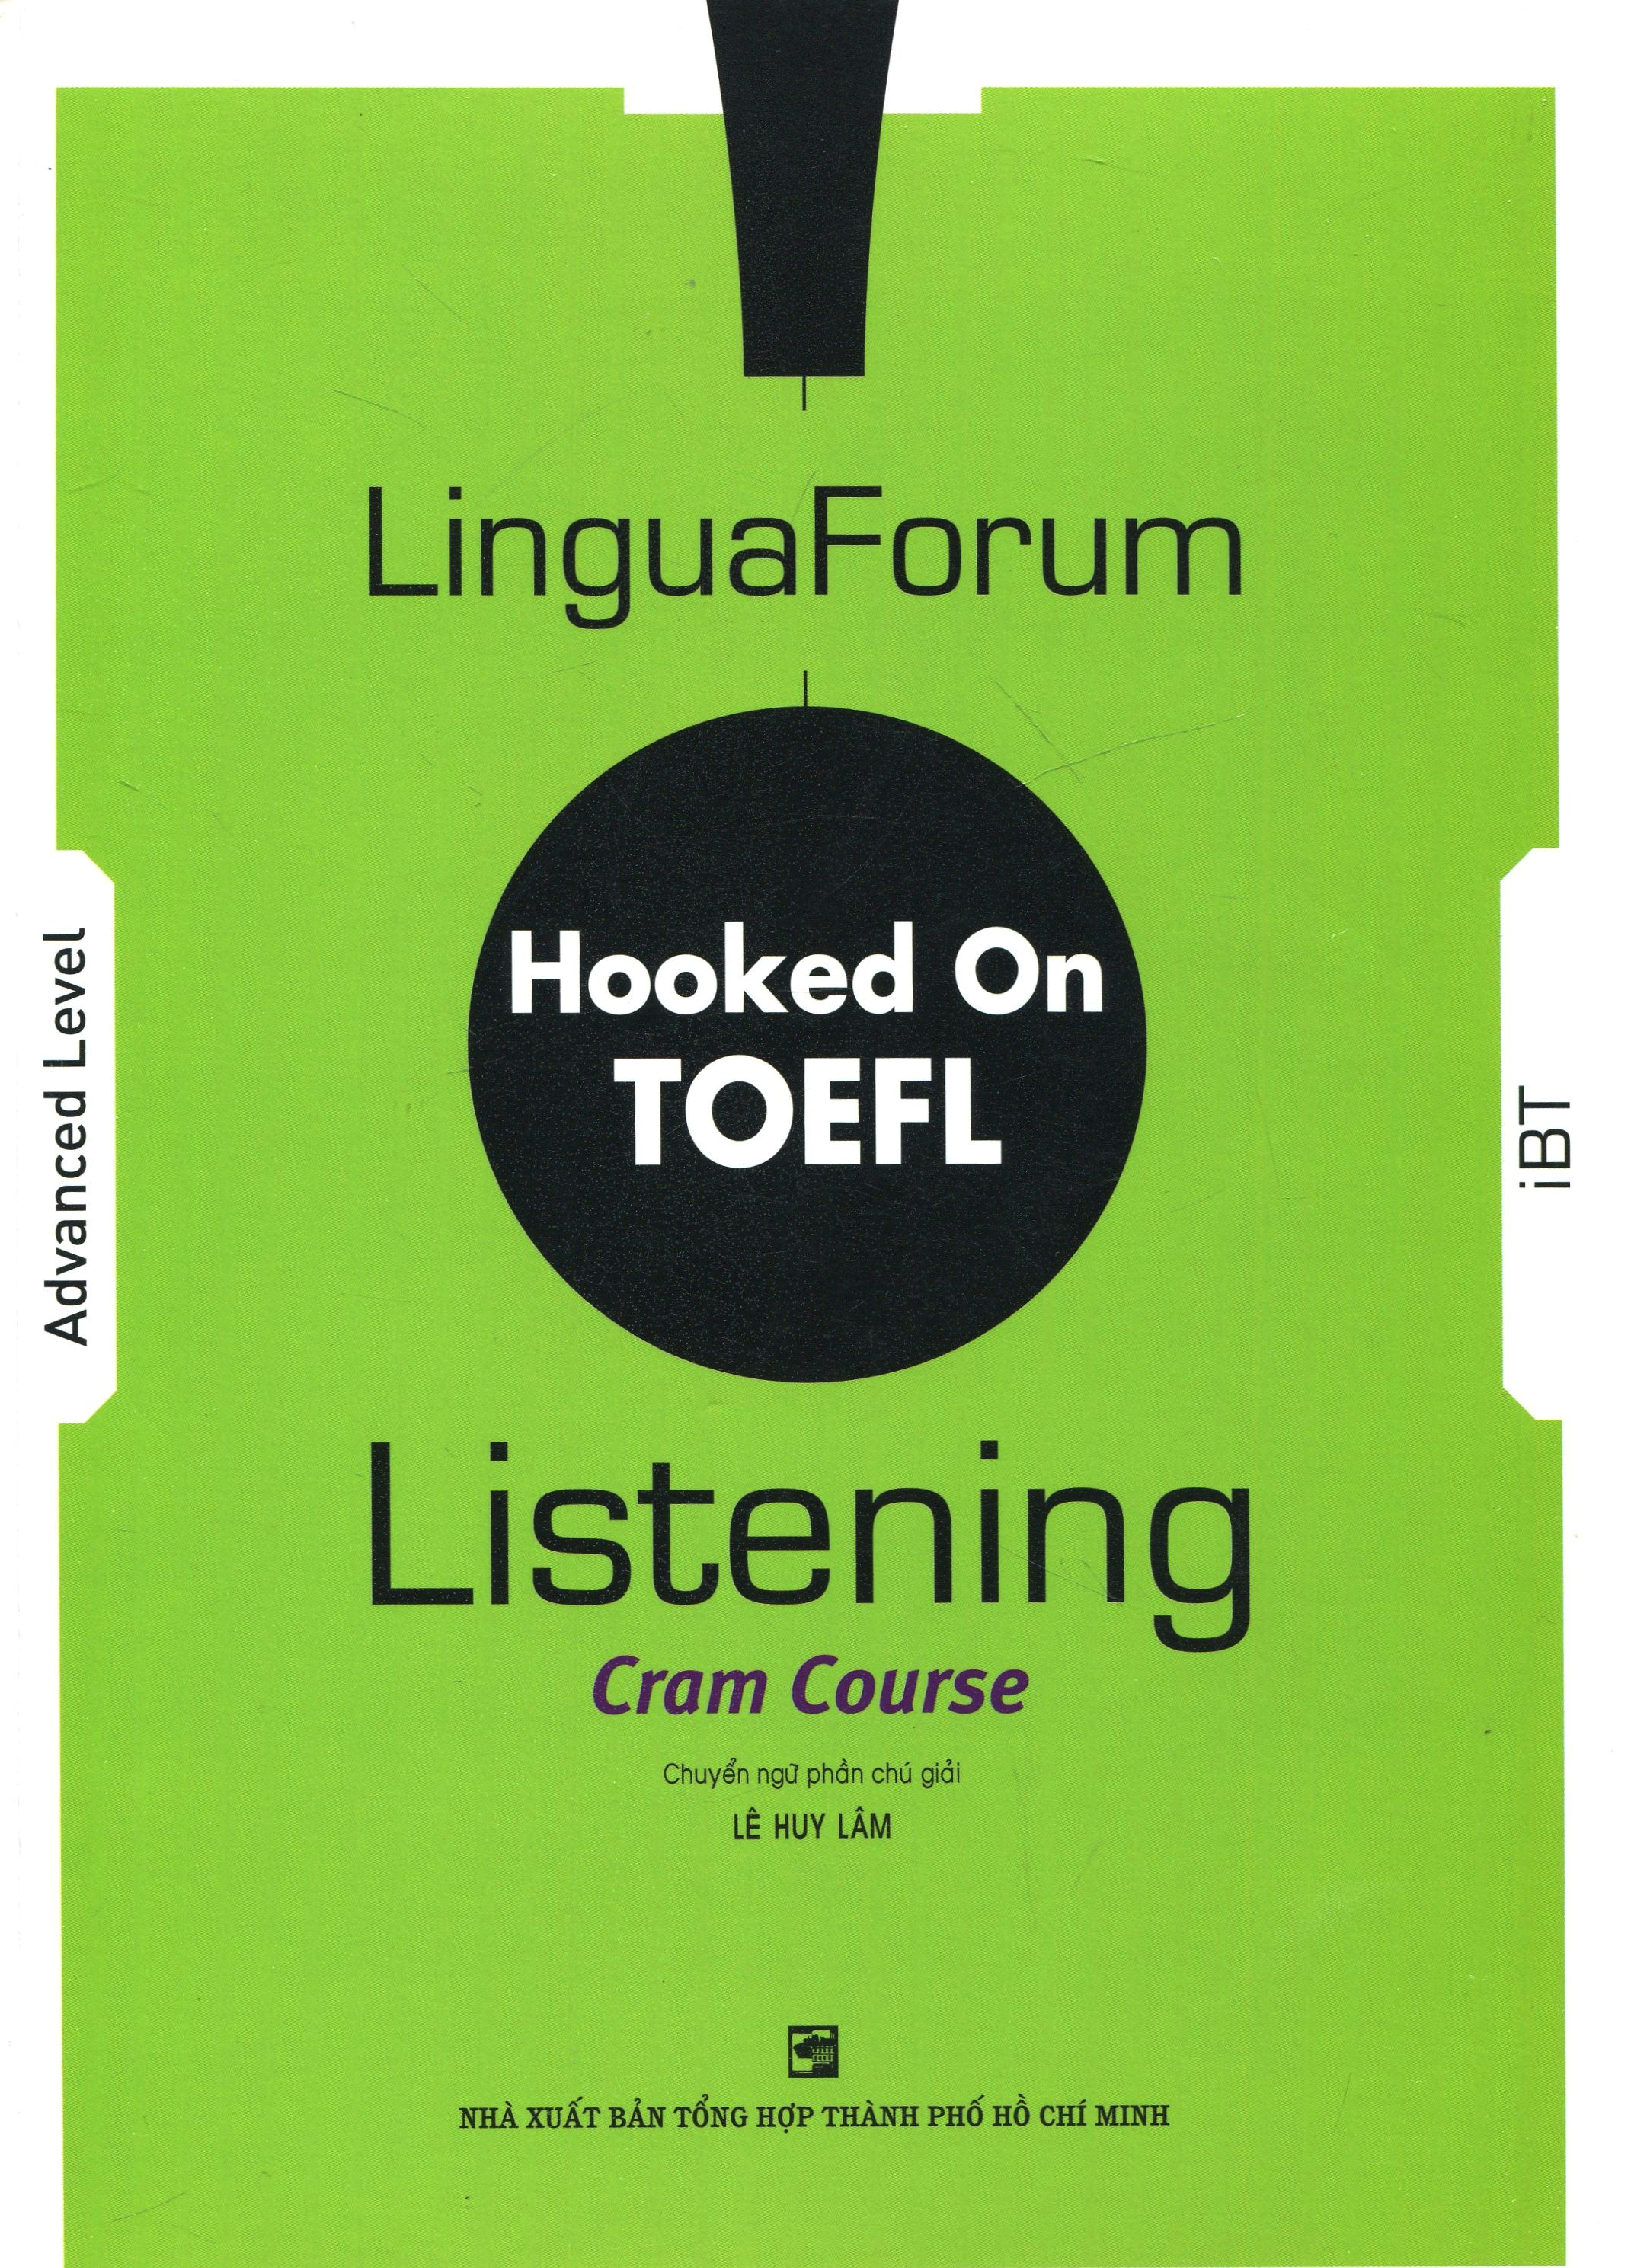 LinguaForum Hooked On TOEFL - Listening Cram Course (Kèm 8 CD)